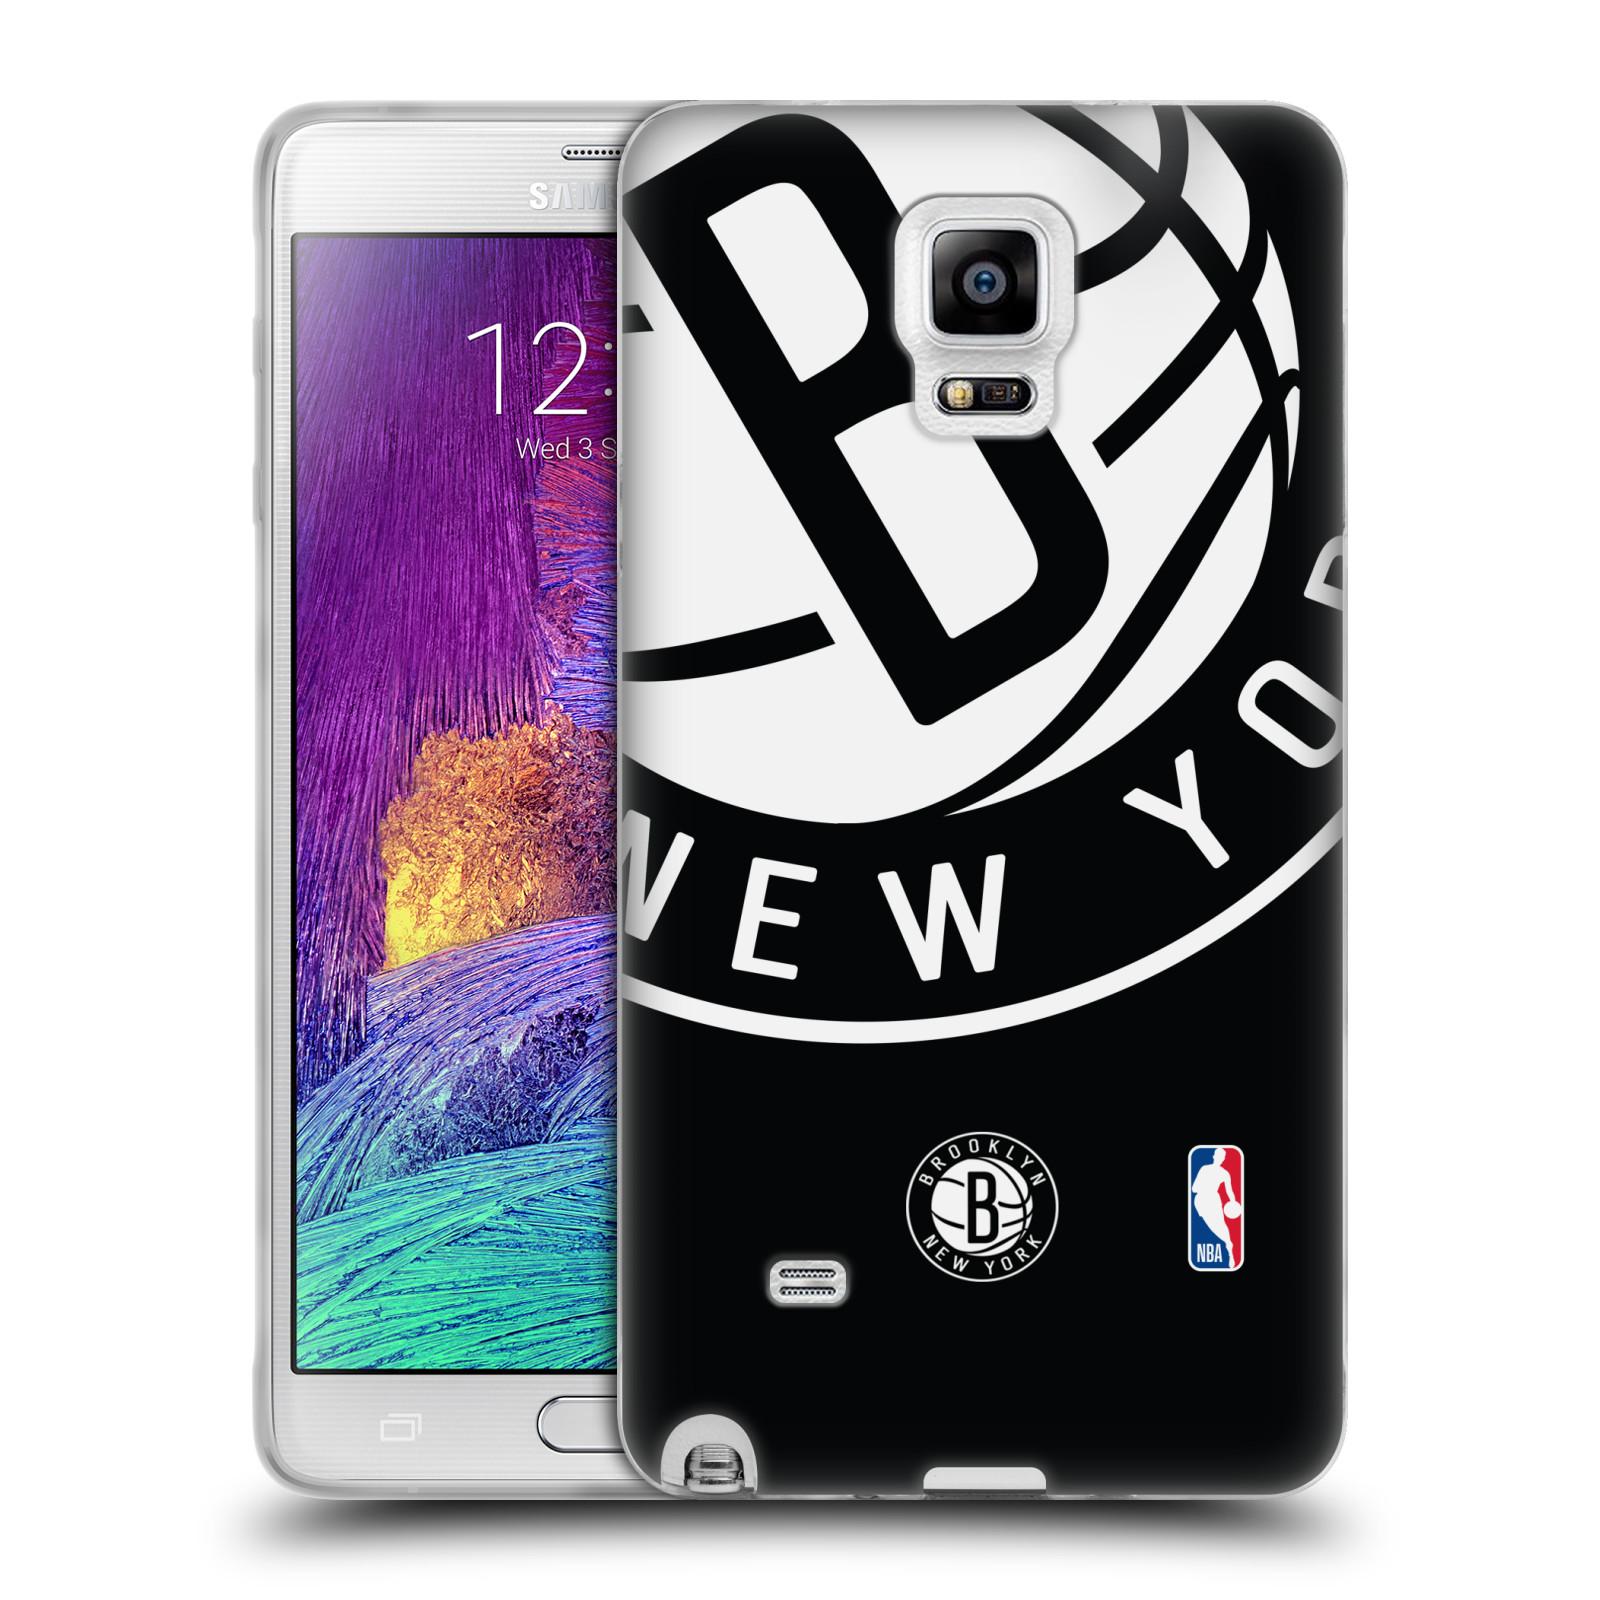 HEAD CASE silikonový obal na mobil Samsung Galaxy Note 4 NBA Basketbalový klub Brooklyn Nets bílé logo na černém pozadí